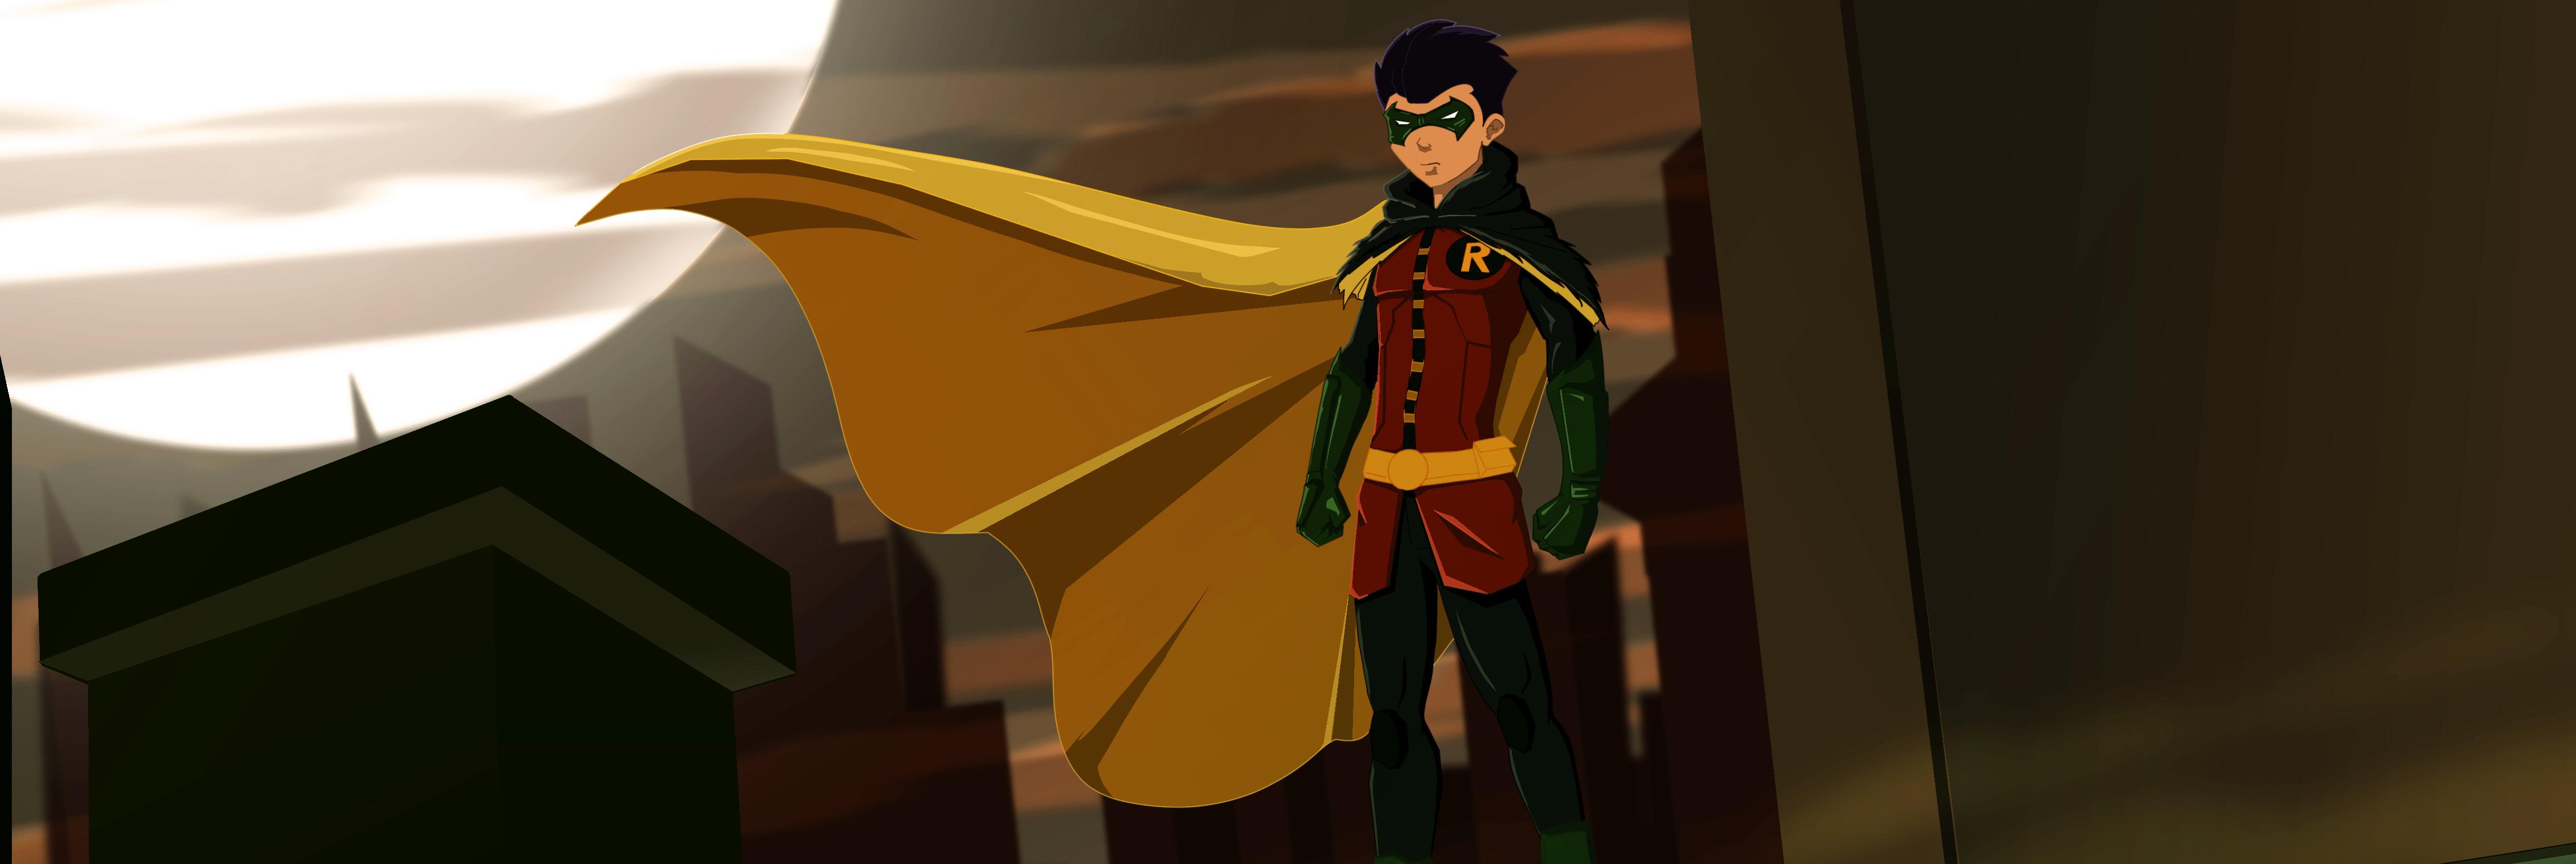 Robin Personnage My Geek Actu Damian Wayne Robin